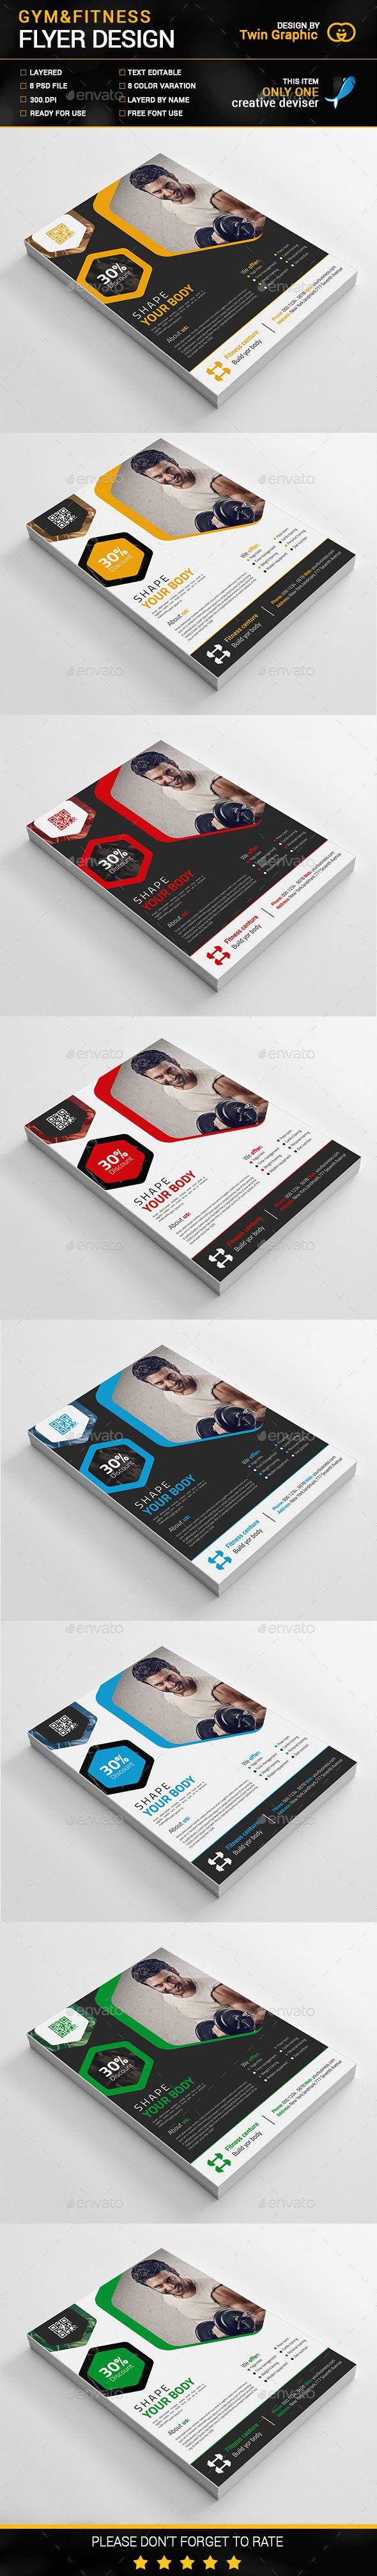 Gym&Fitness Flyer Design | Publicitaria y Taller